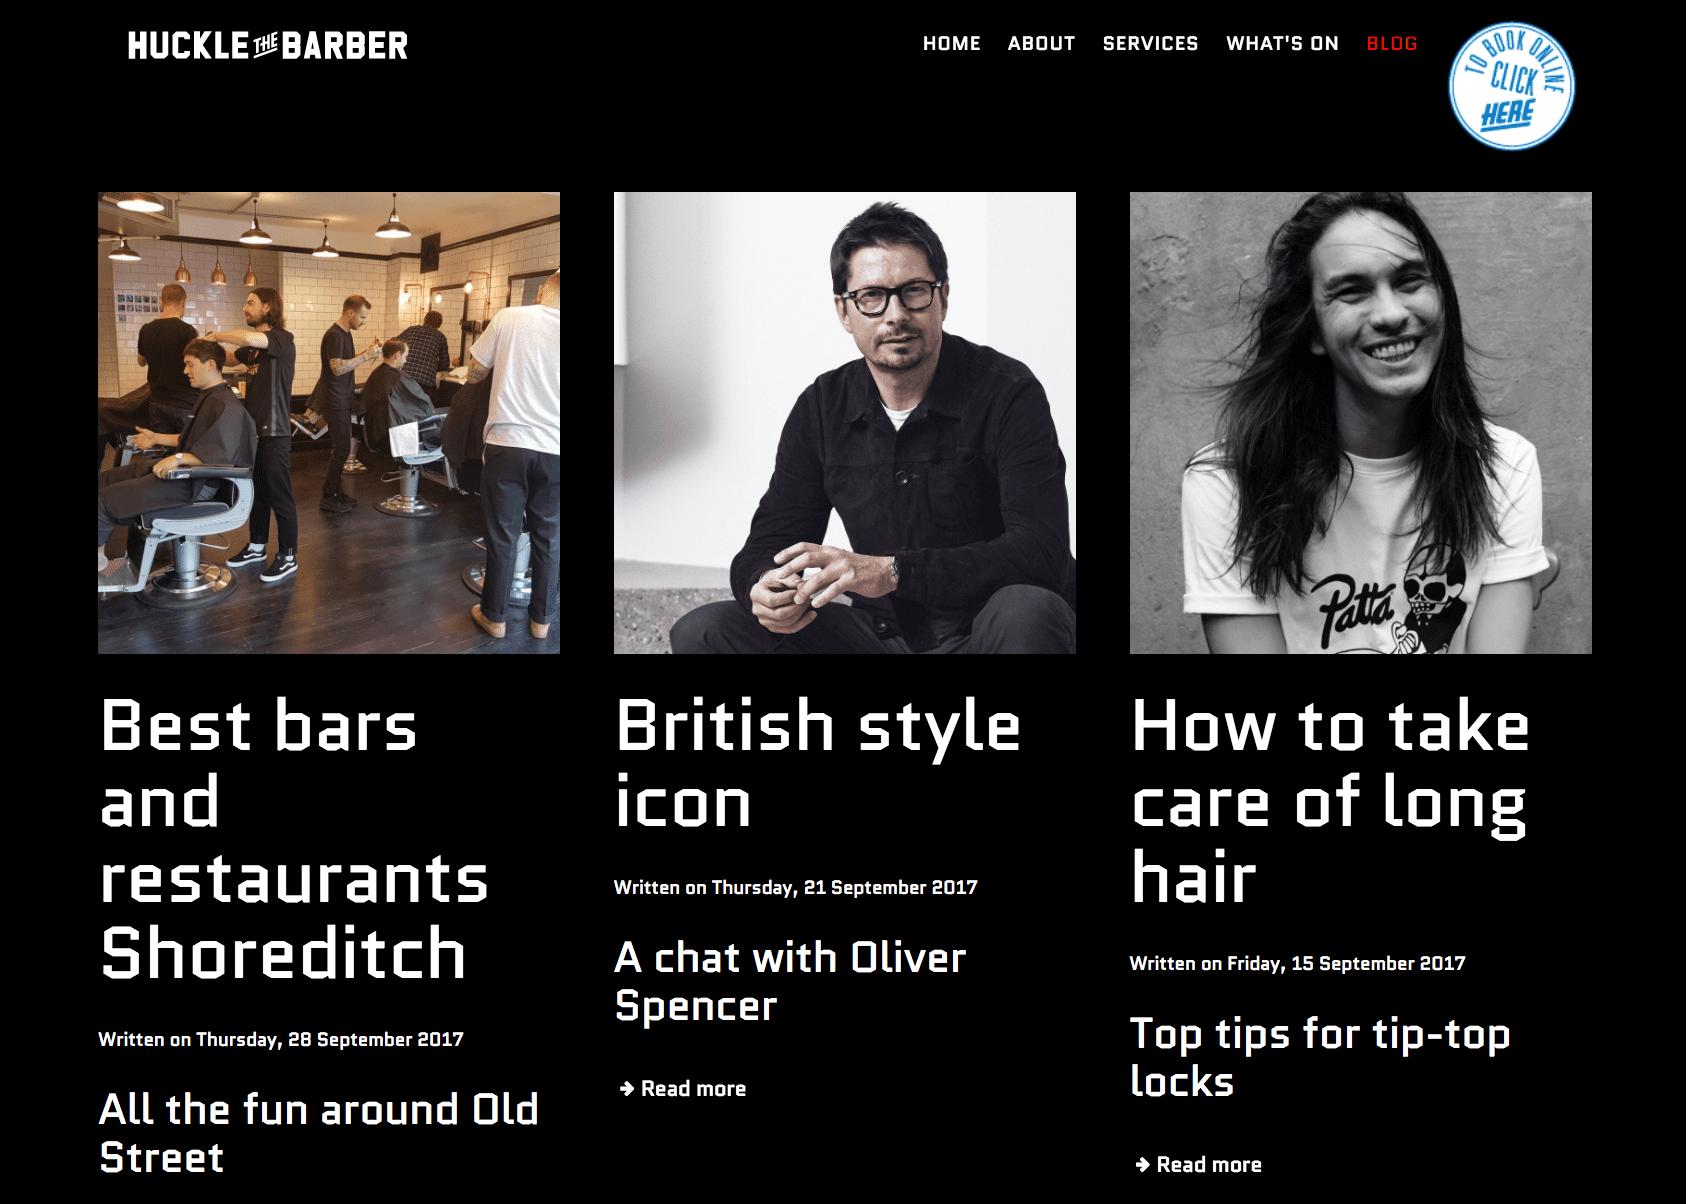 Screen Shot 2017 09 29 at 15.28.17 - Huckle the Barber Blog